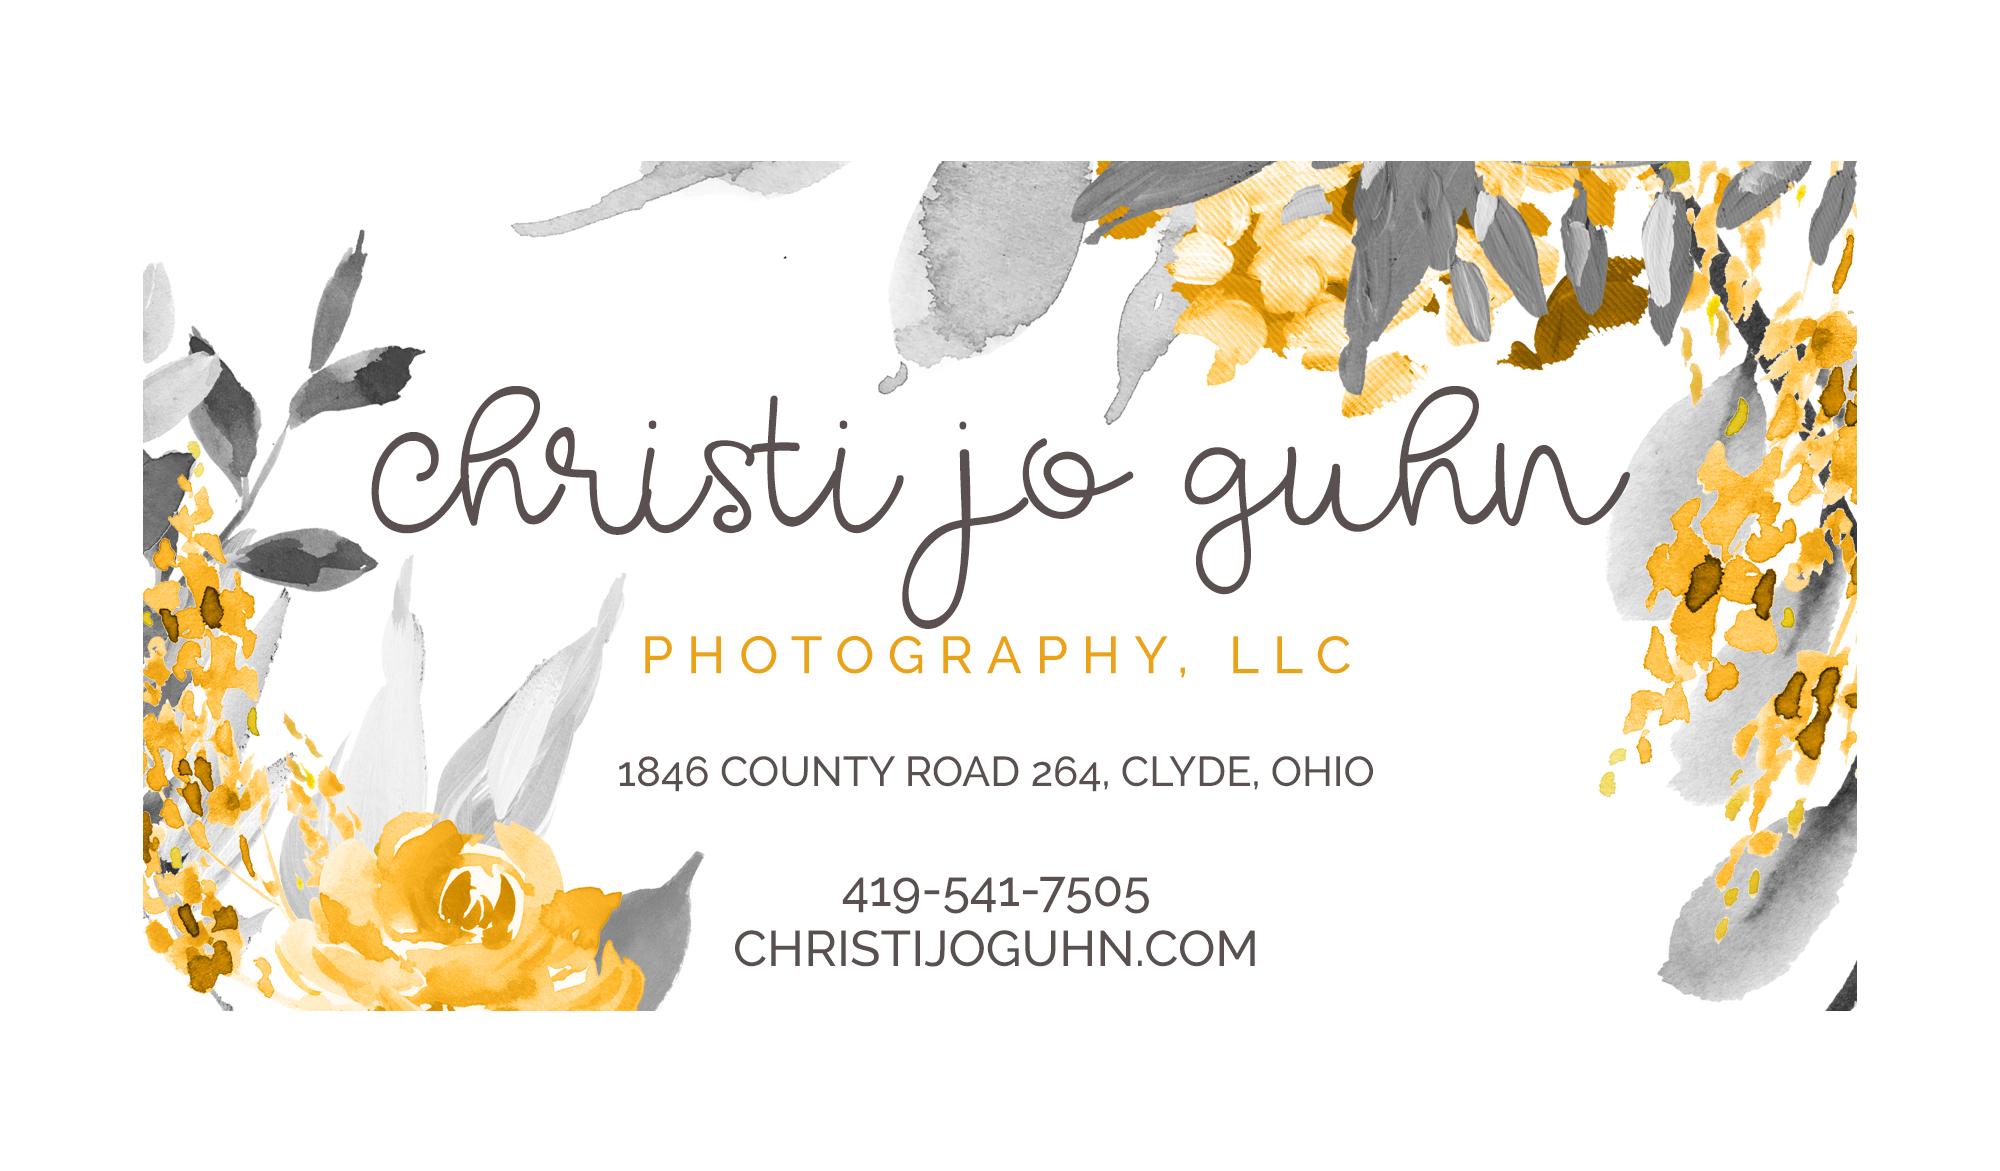 Christi Jo Guhn Photography